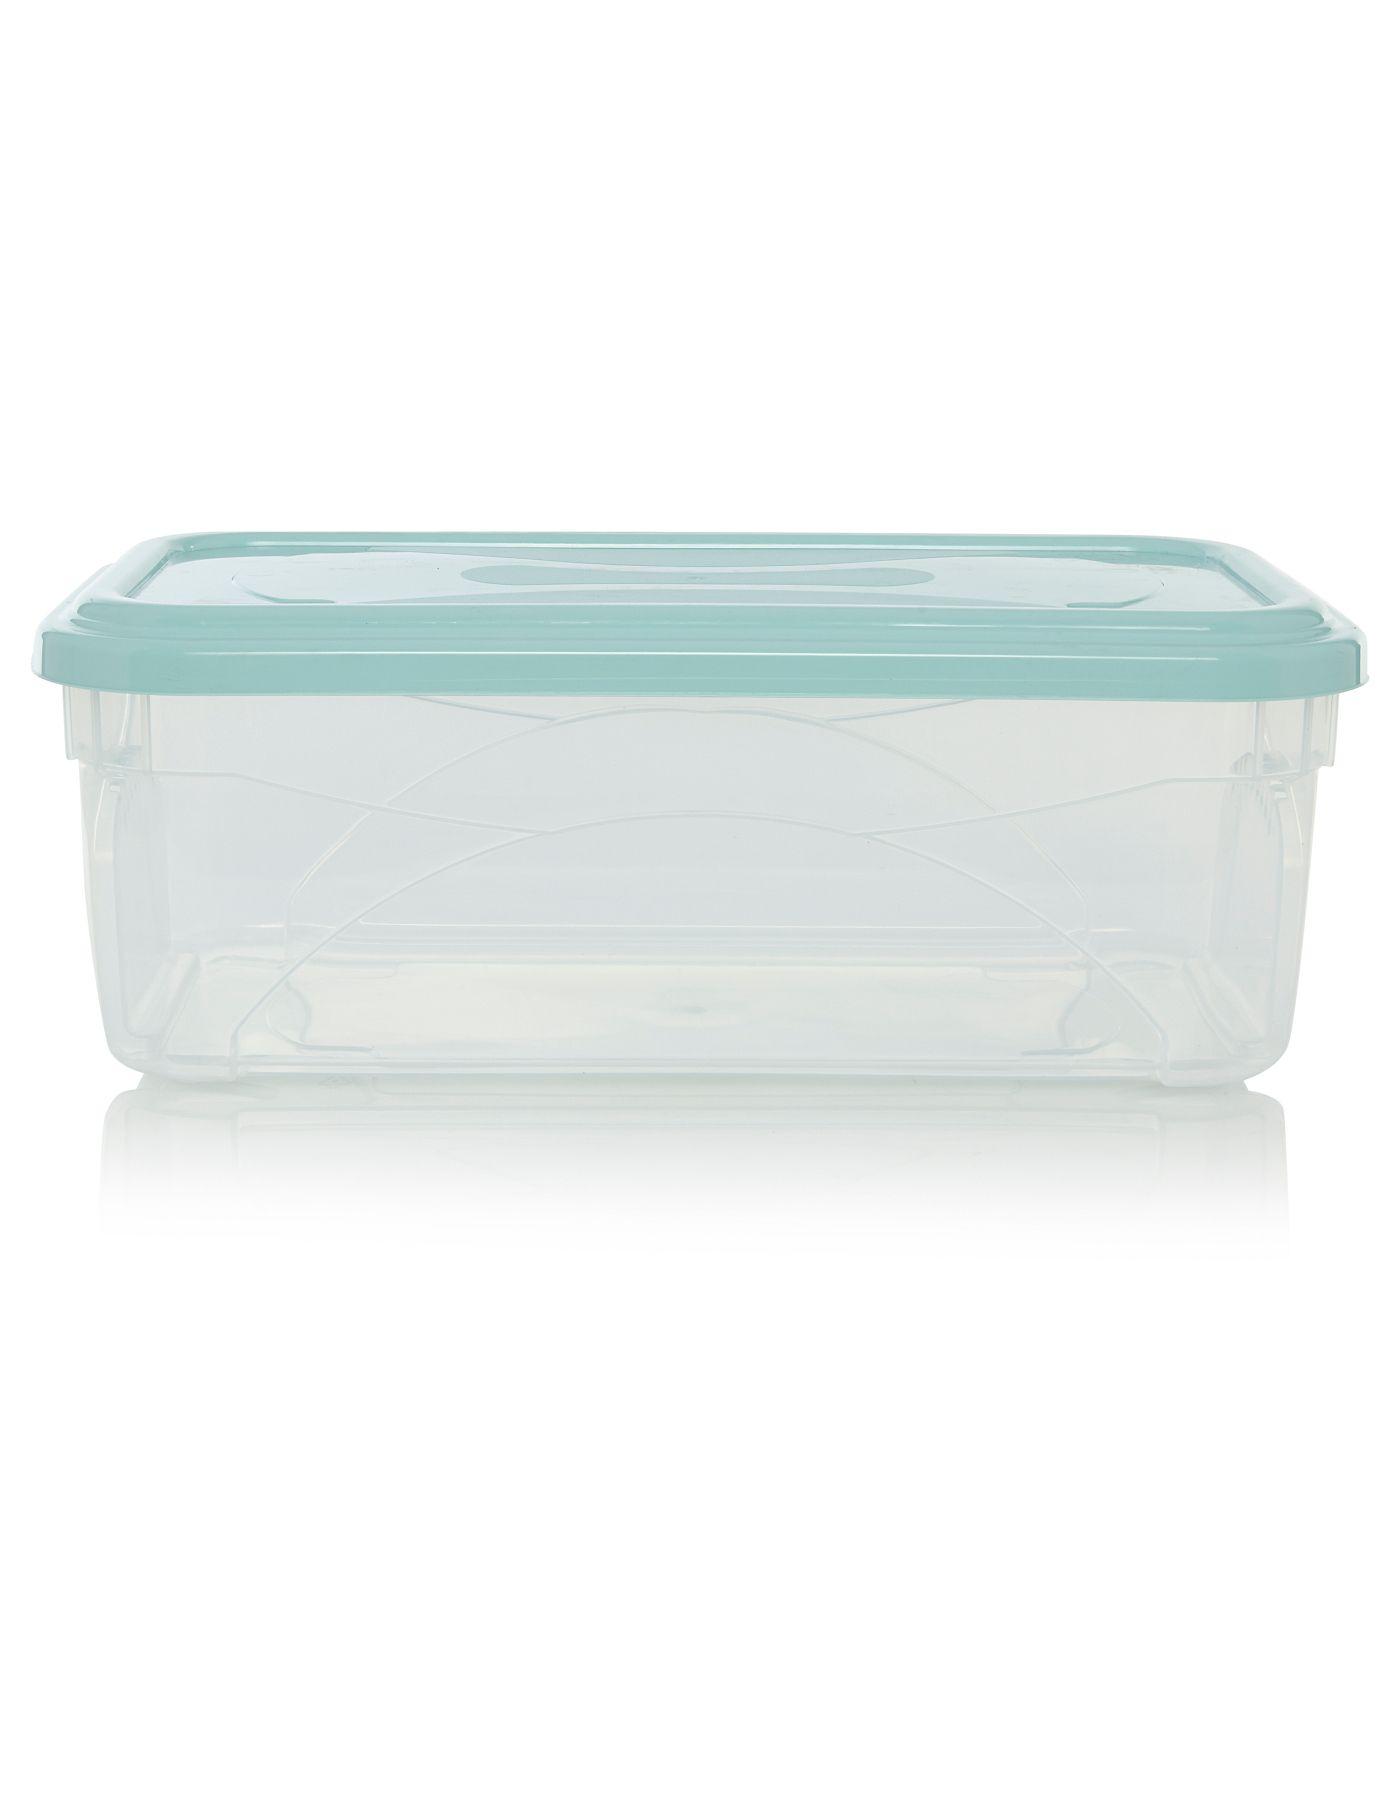 asda 11l shoe storage box lid various colours storage asda